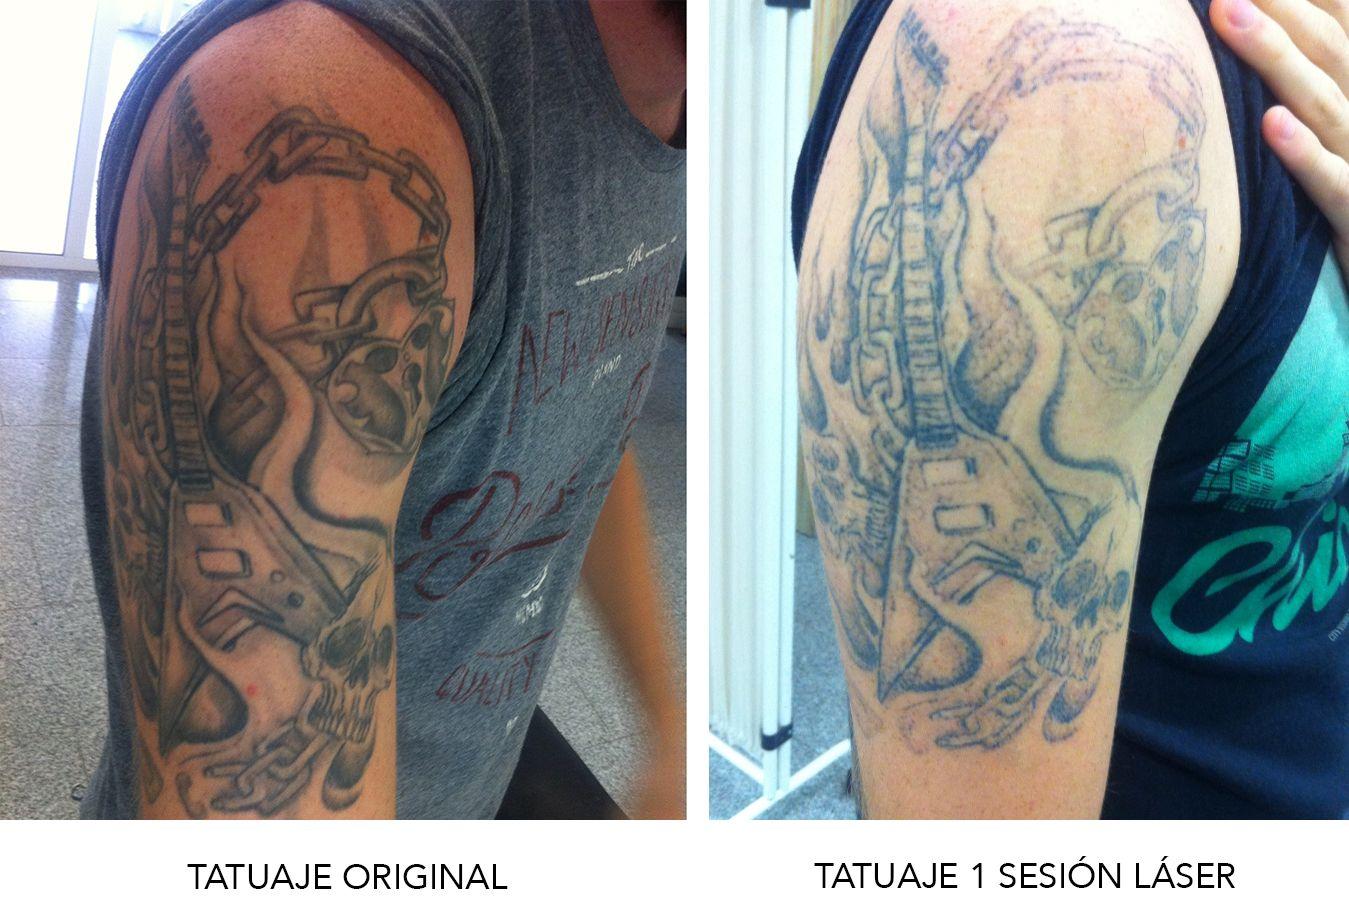 Kalinda Cano Tatuajes como borrar tatuajes caseros